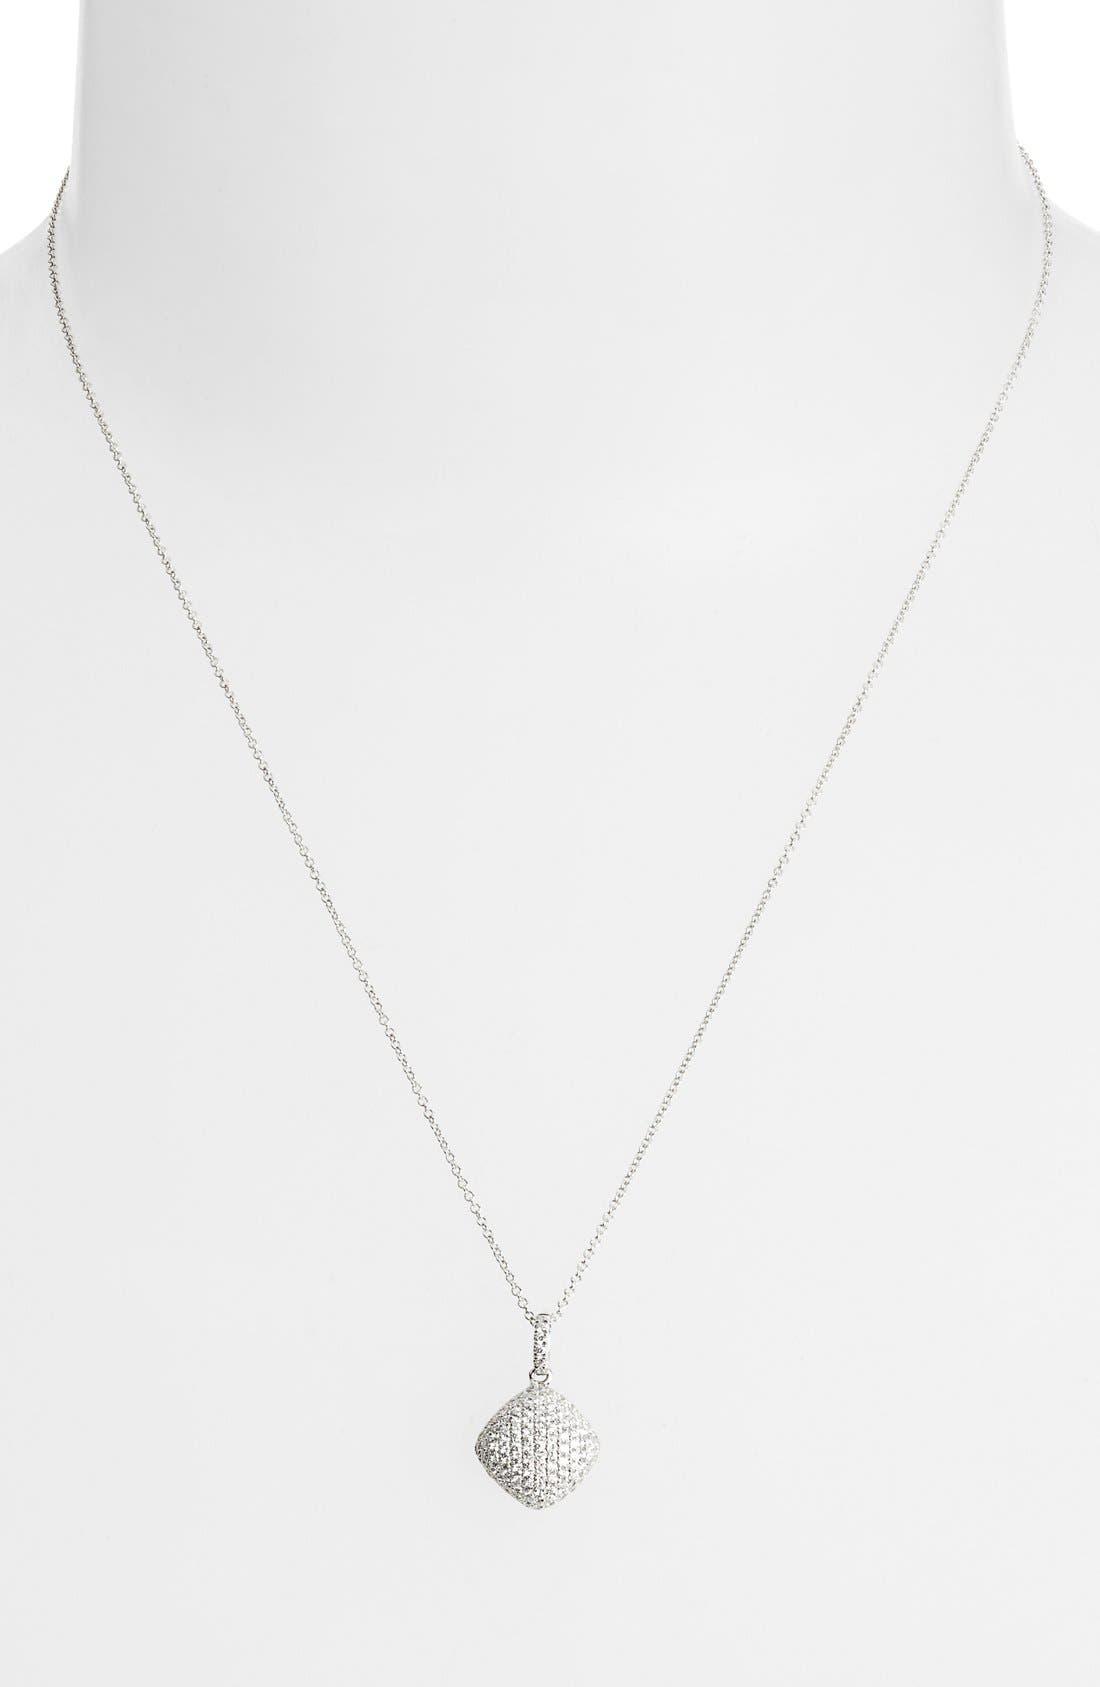 Main Image - Bony Levy Pavé Diamond Pendant Necklace (Limited Edition) (Nordstrom Exclusive)